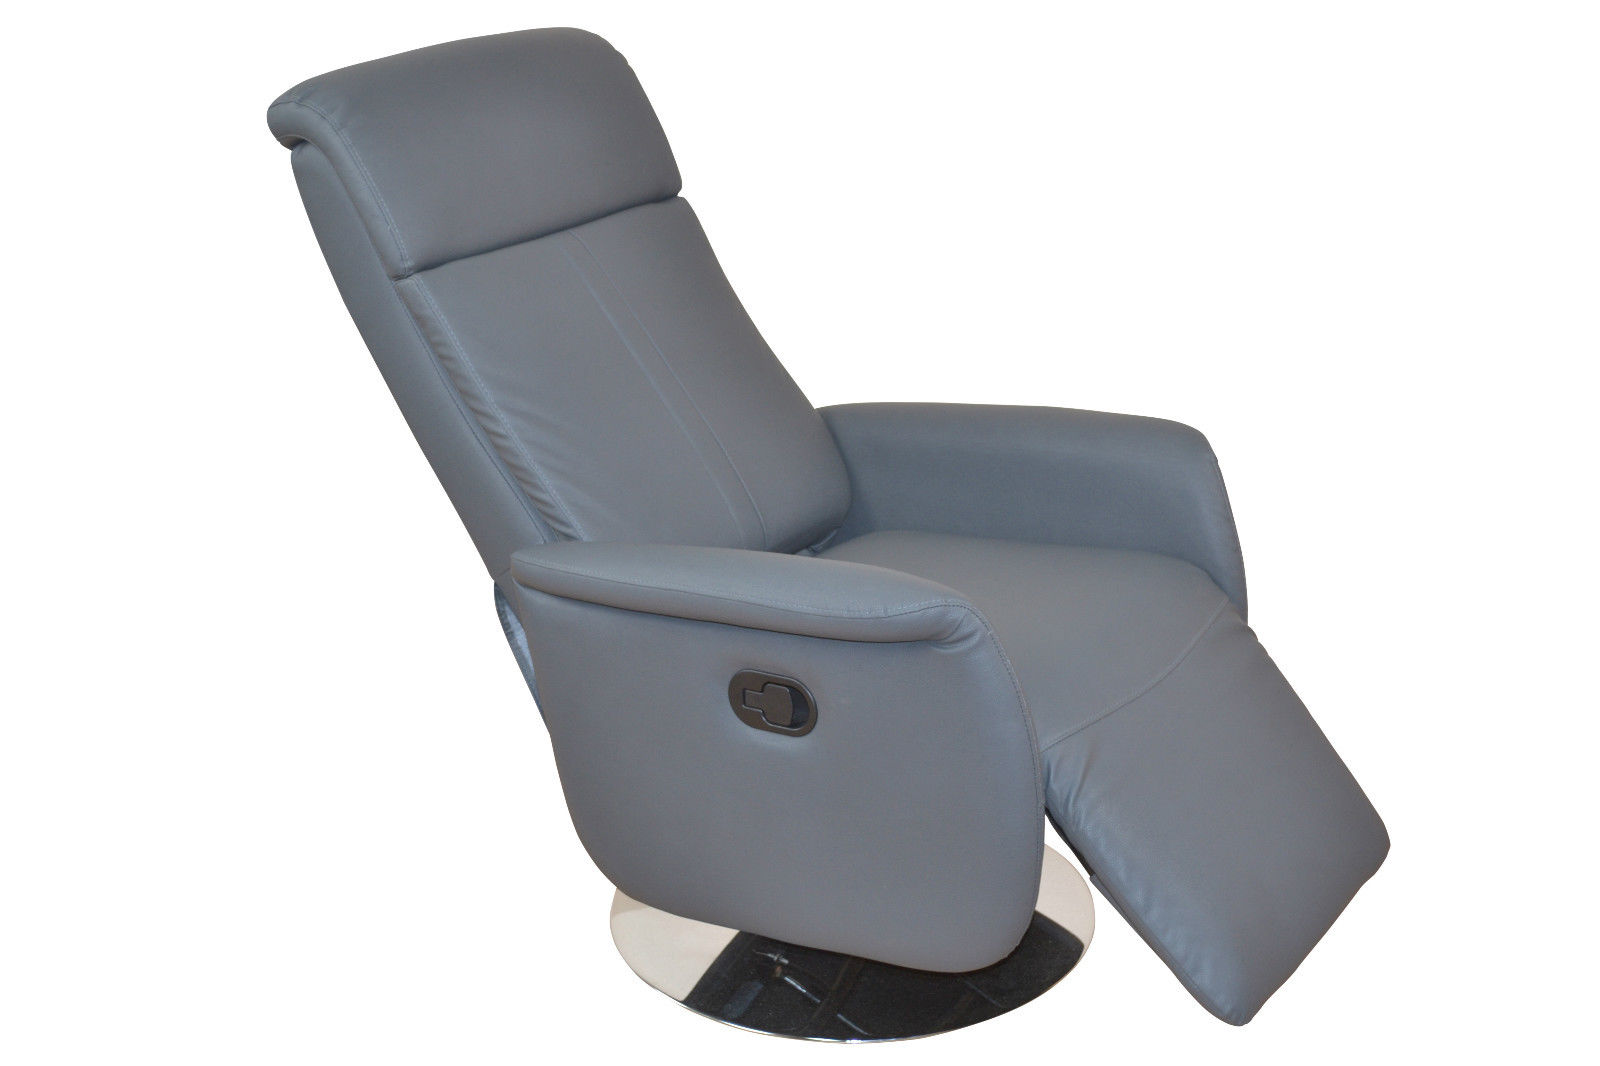 fernsehsessel drehbar grau relaxsessel schwingsessel. Black Bedroom Furniture Sets. Home Design Ideas